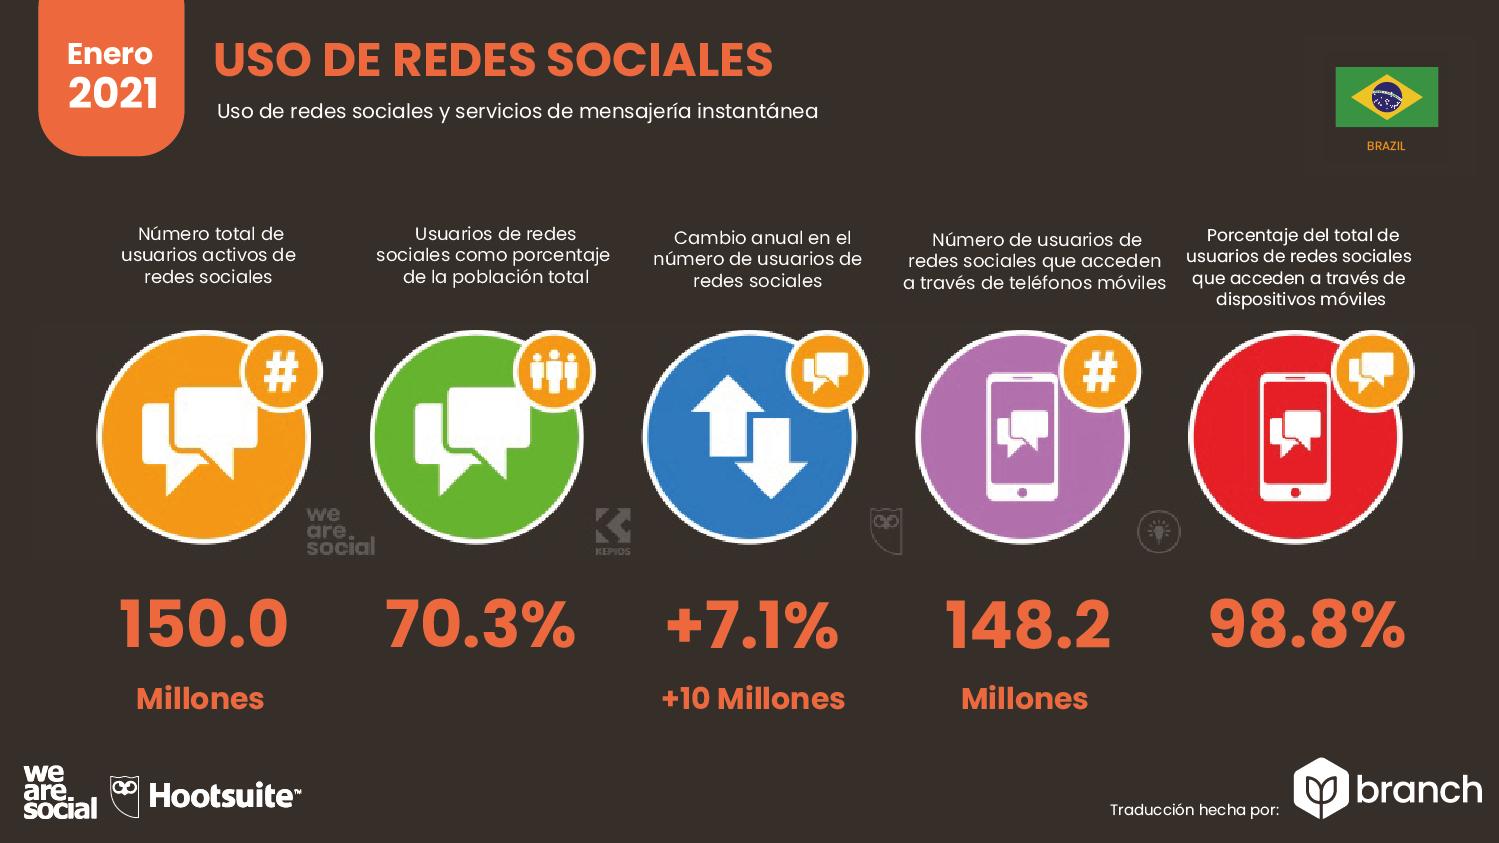 uso-de-redes-sociales-brasil-2020-2021